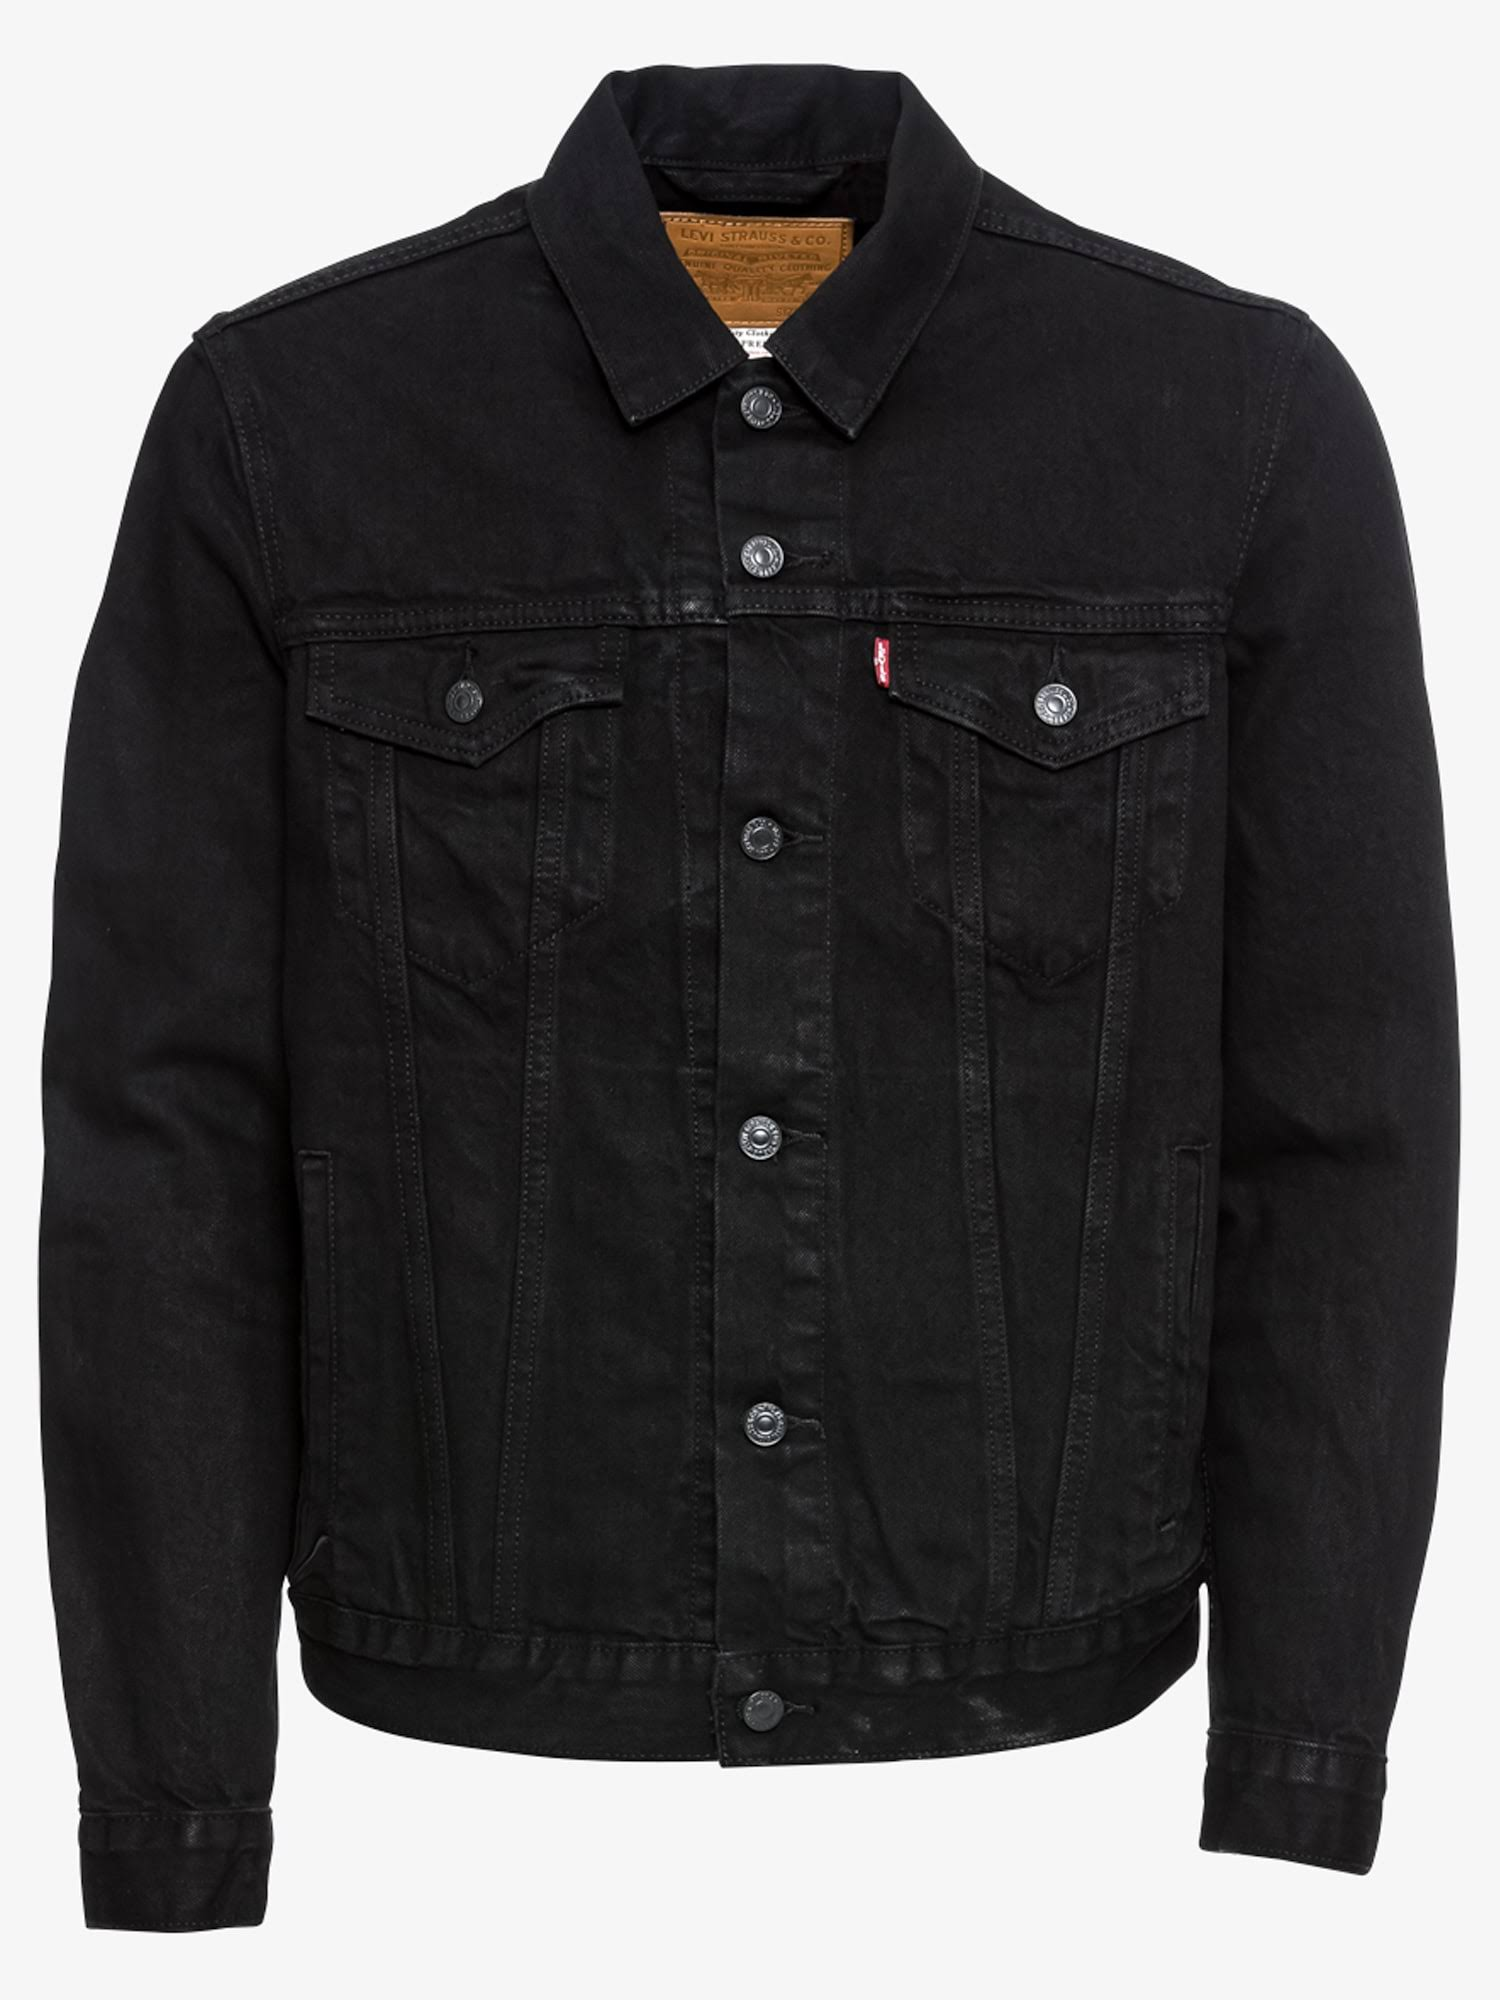 Hombres Jacket Xs Tamaño Levi's The Black Denim Berk Jeans Trucker Birk wwU0Xt